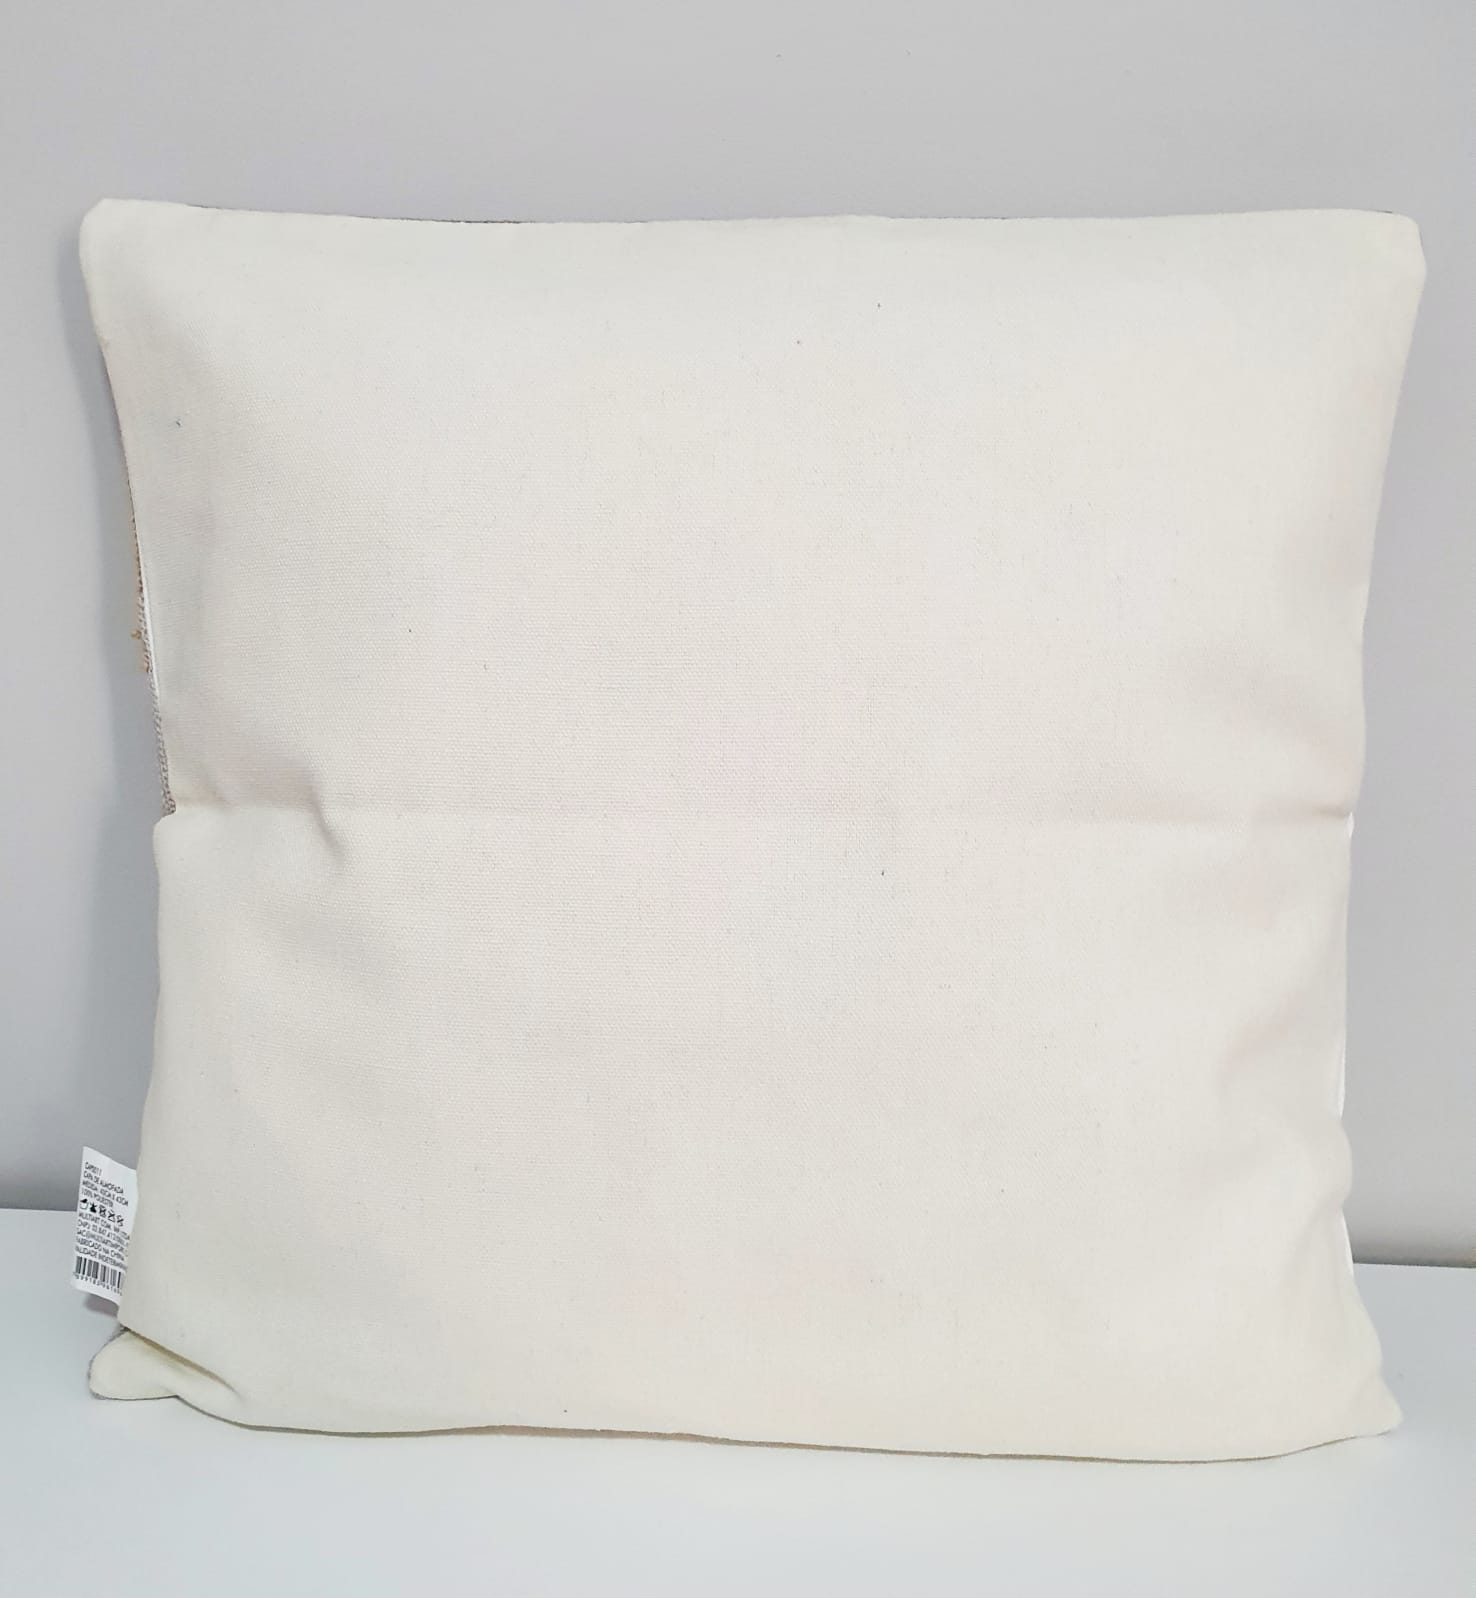 Capa para almofada - Tricô macramê 5 tons